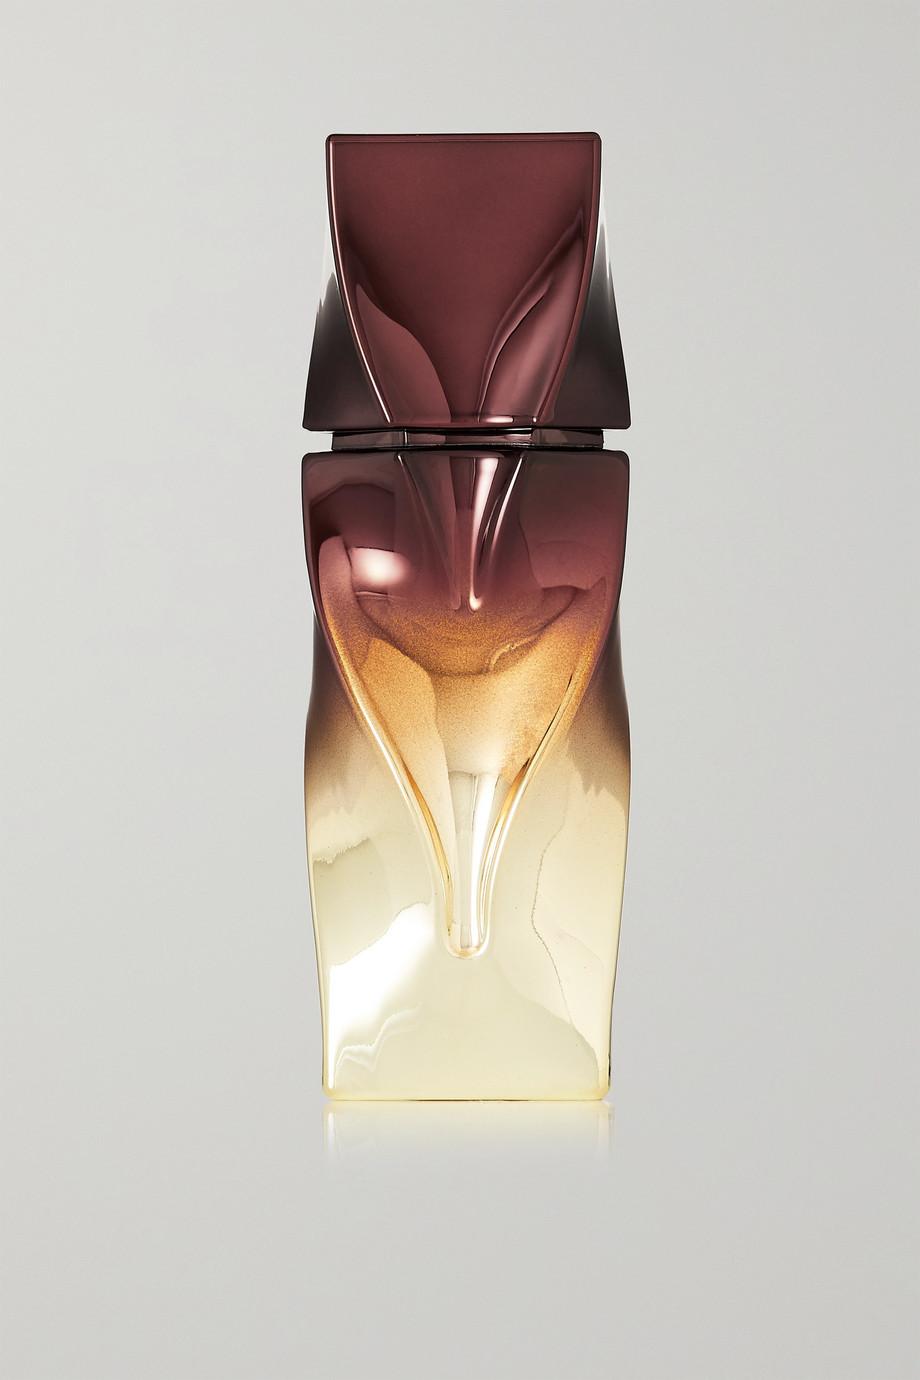 Christian Louboutin Beauty Bikini Questa Sera Perfume Oil, 30ml